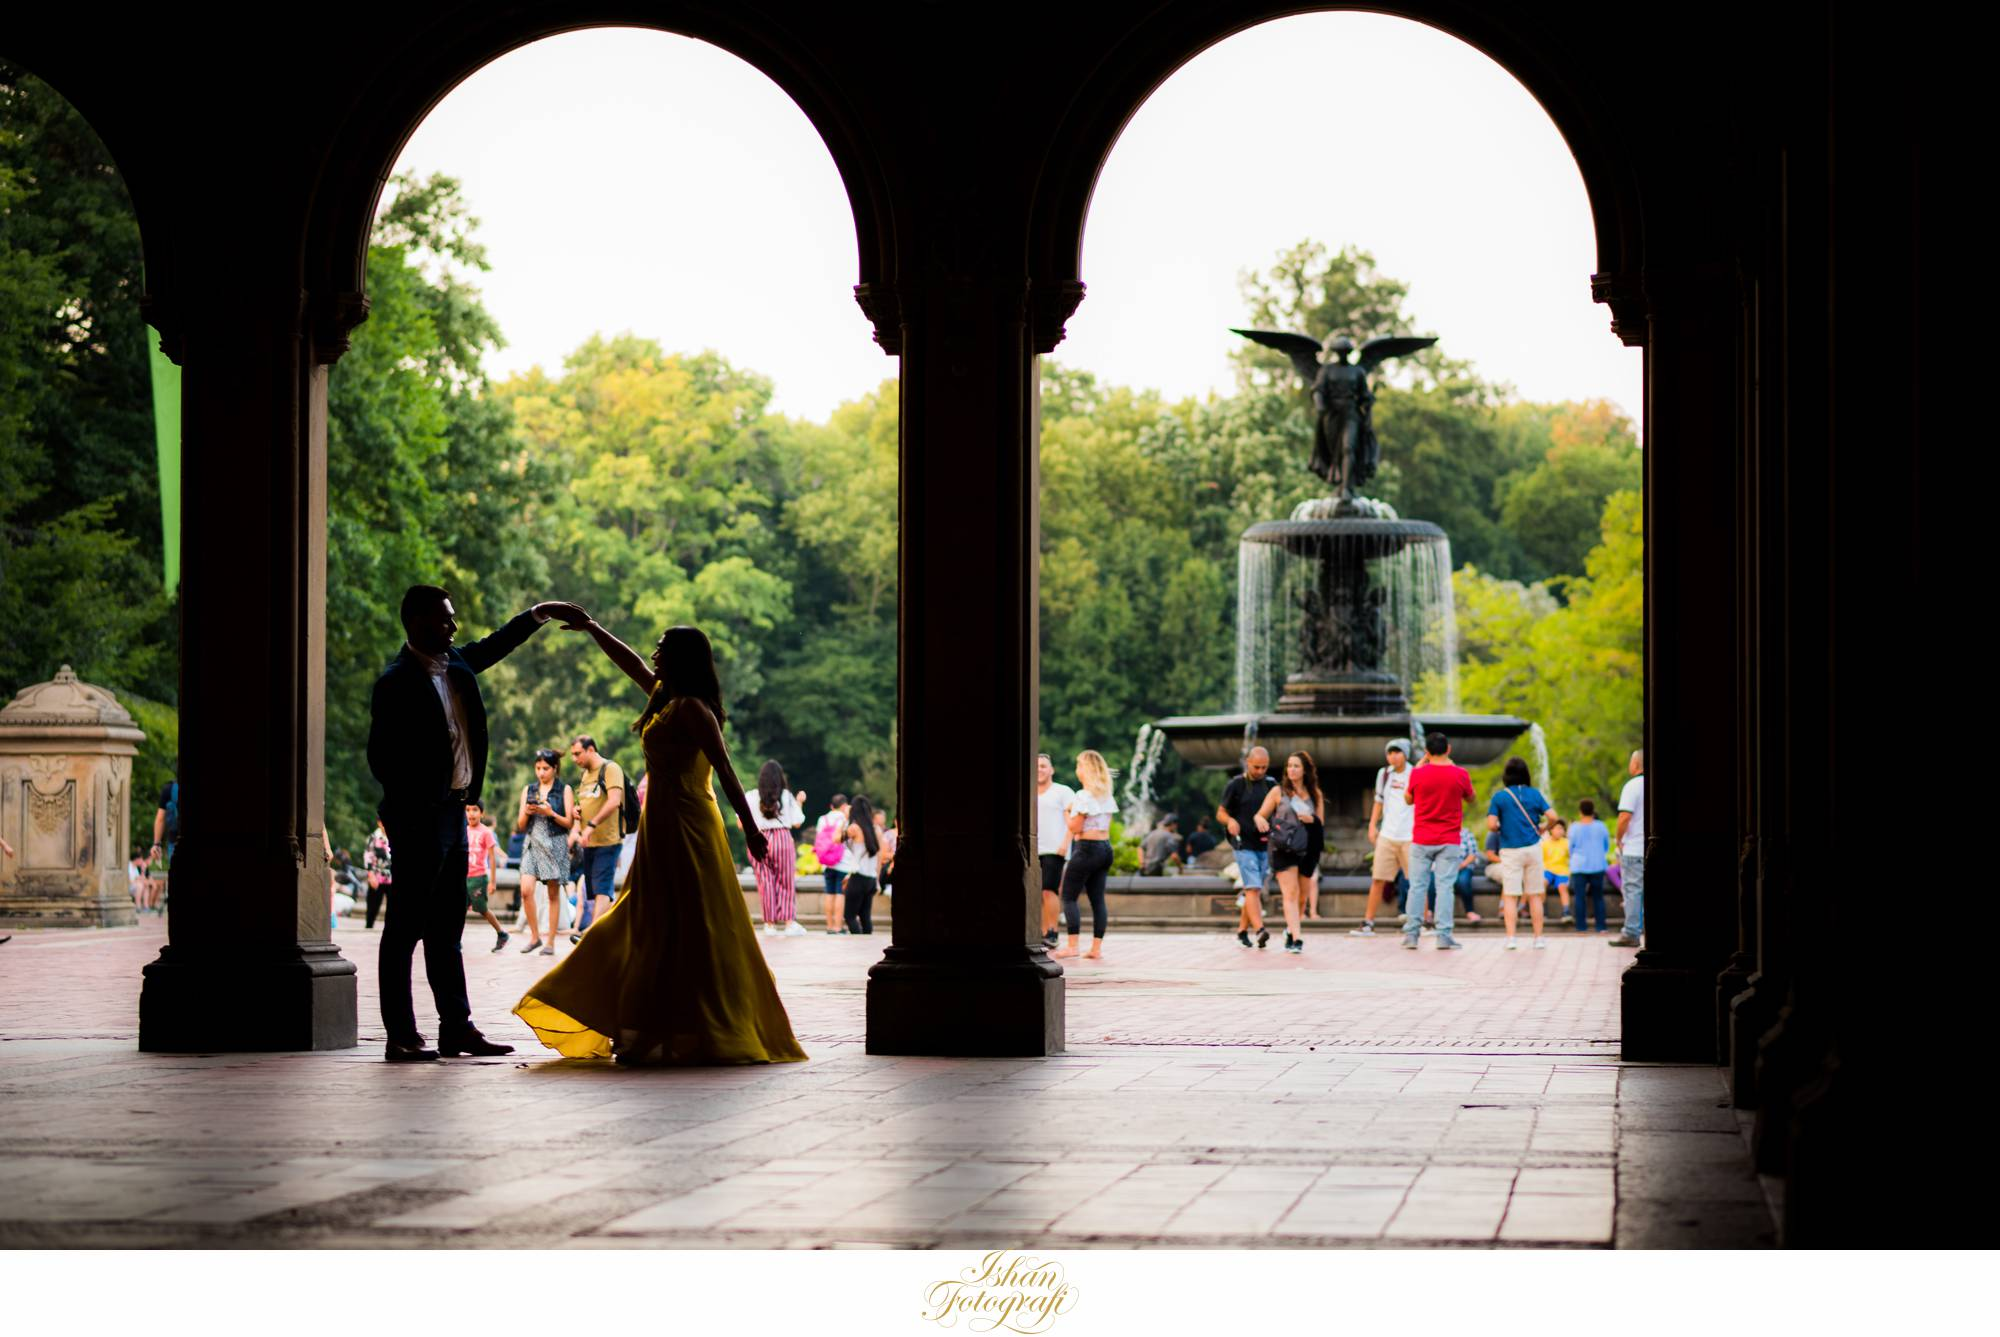 best-central-park-location-for-engagement-photos